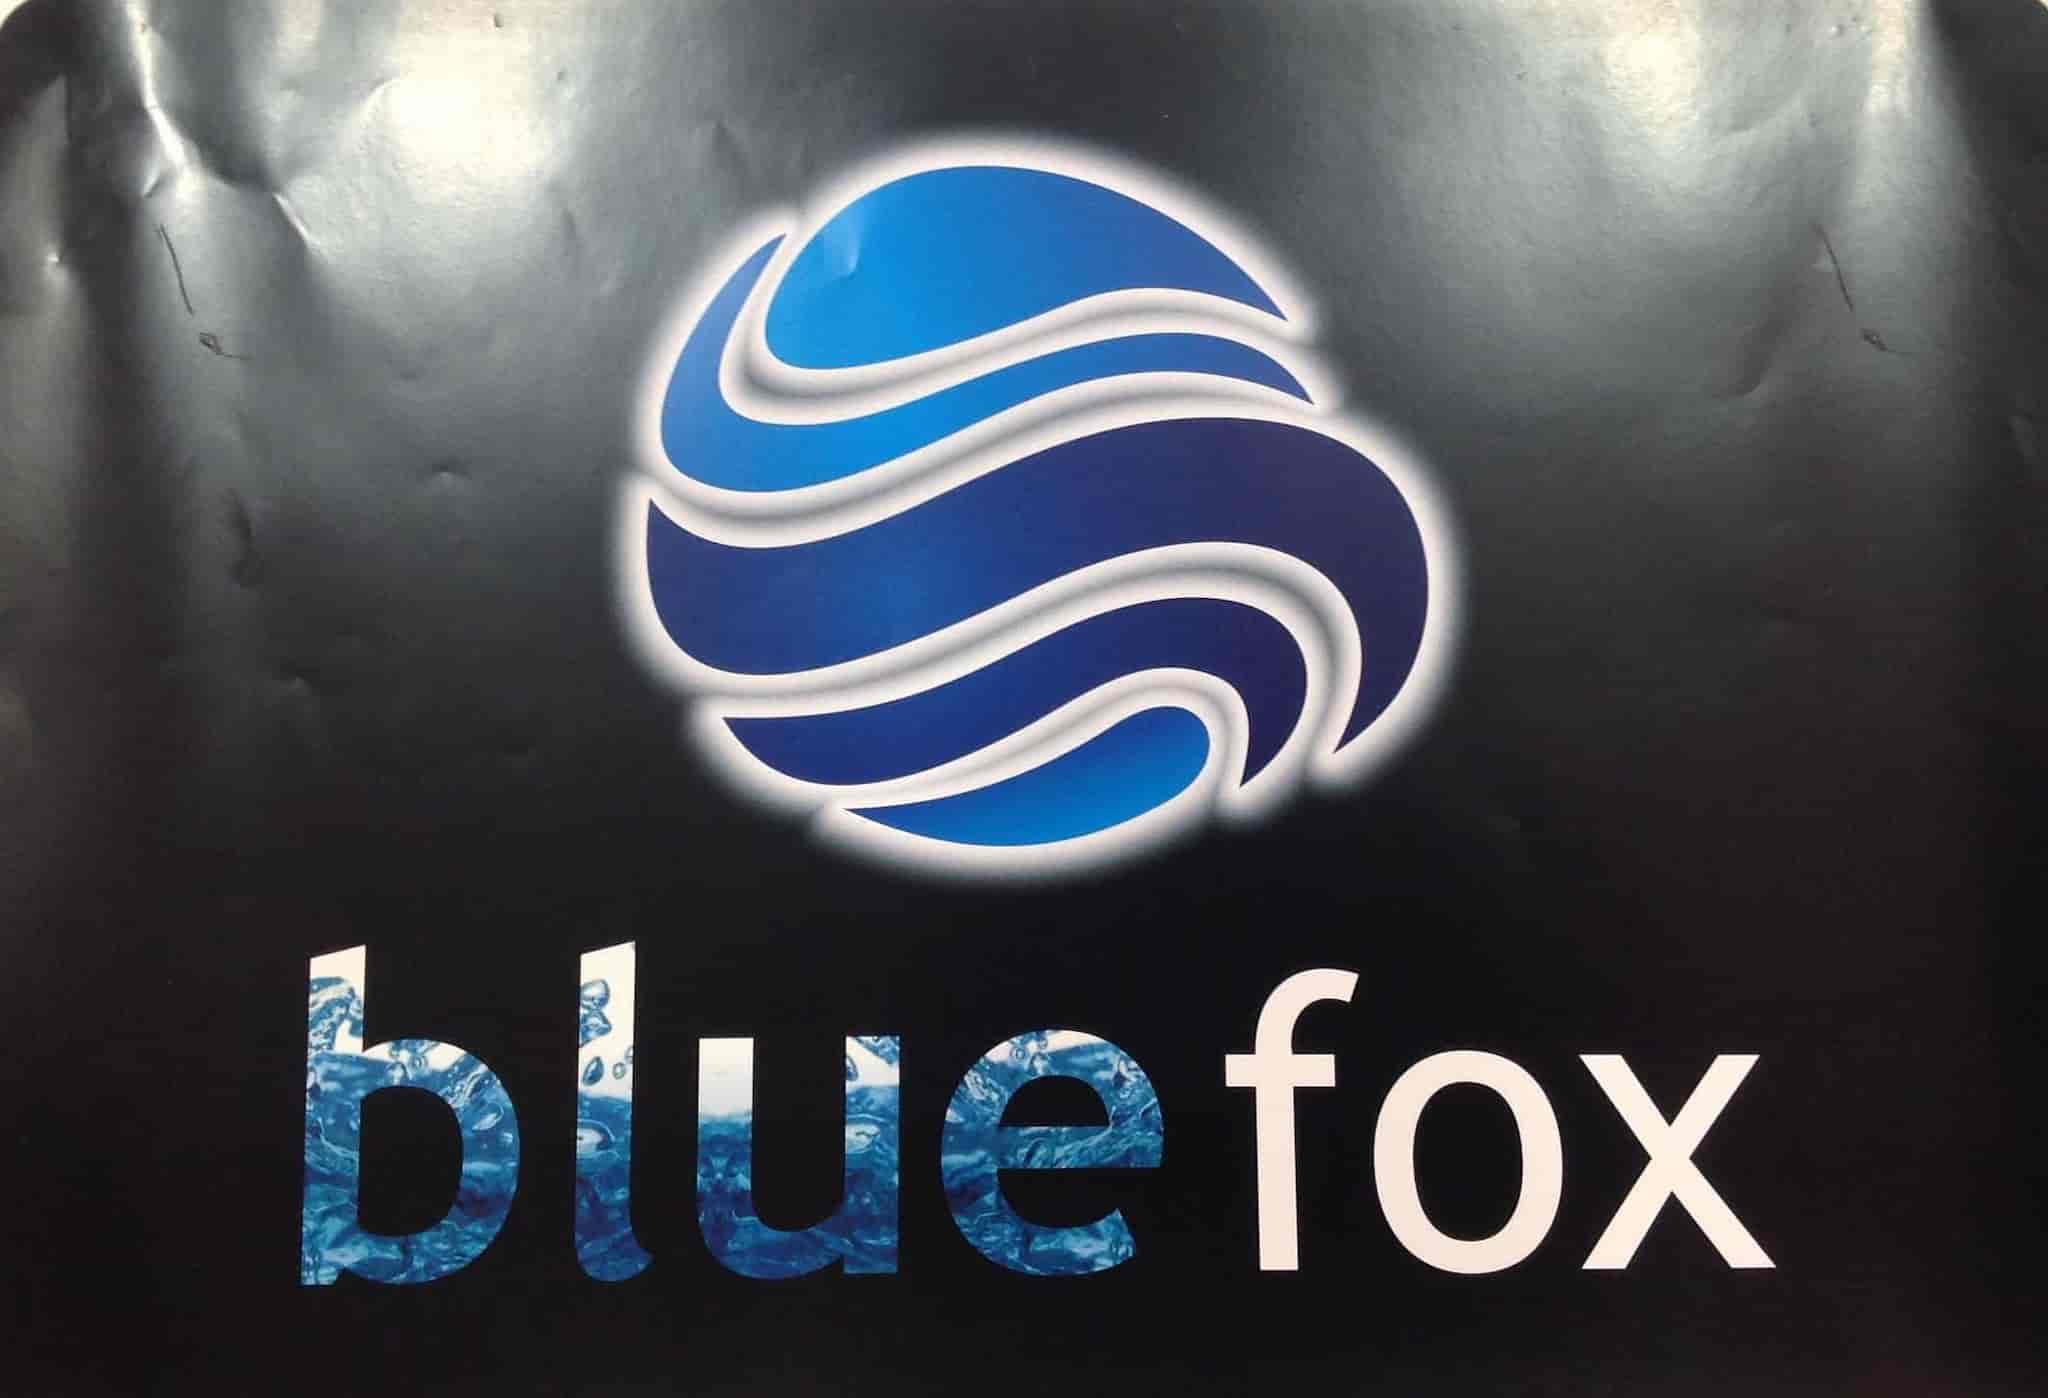 bluefox-overseas-feroze-gandhi-market-ludhiana-travel-agents-da99z.jpg